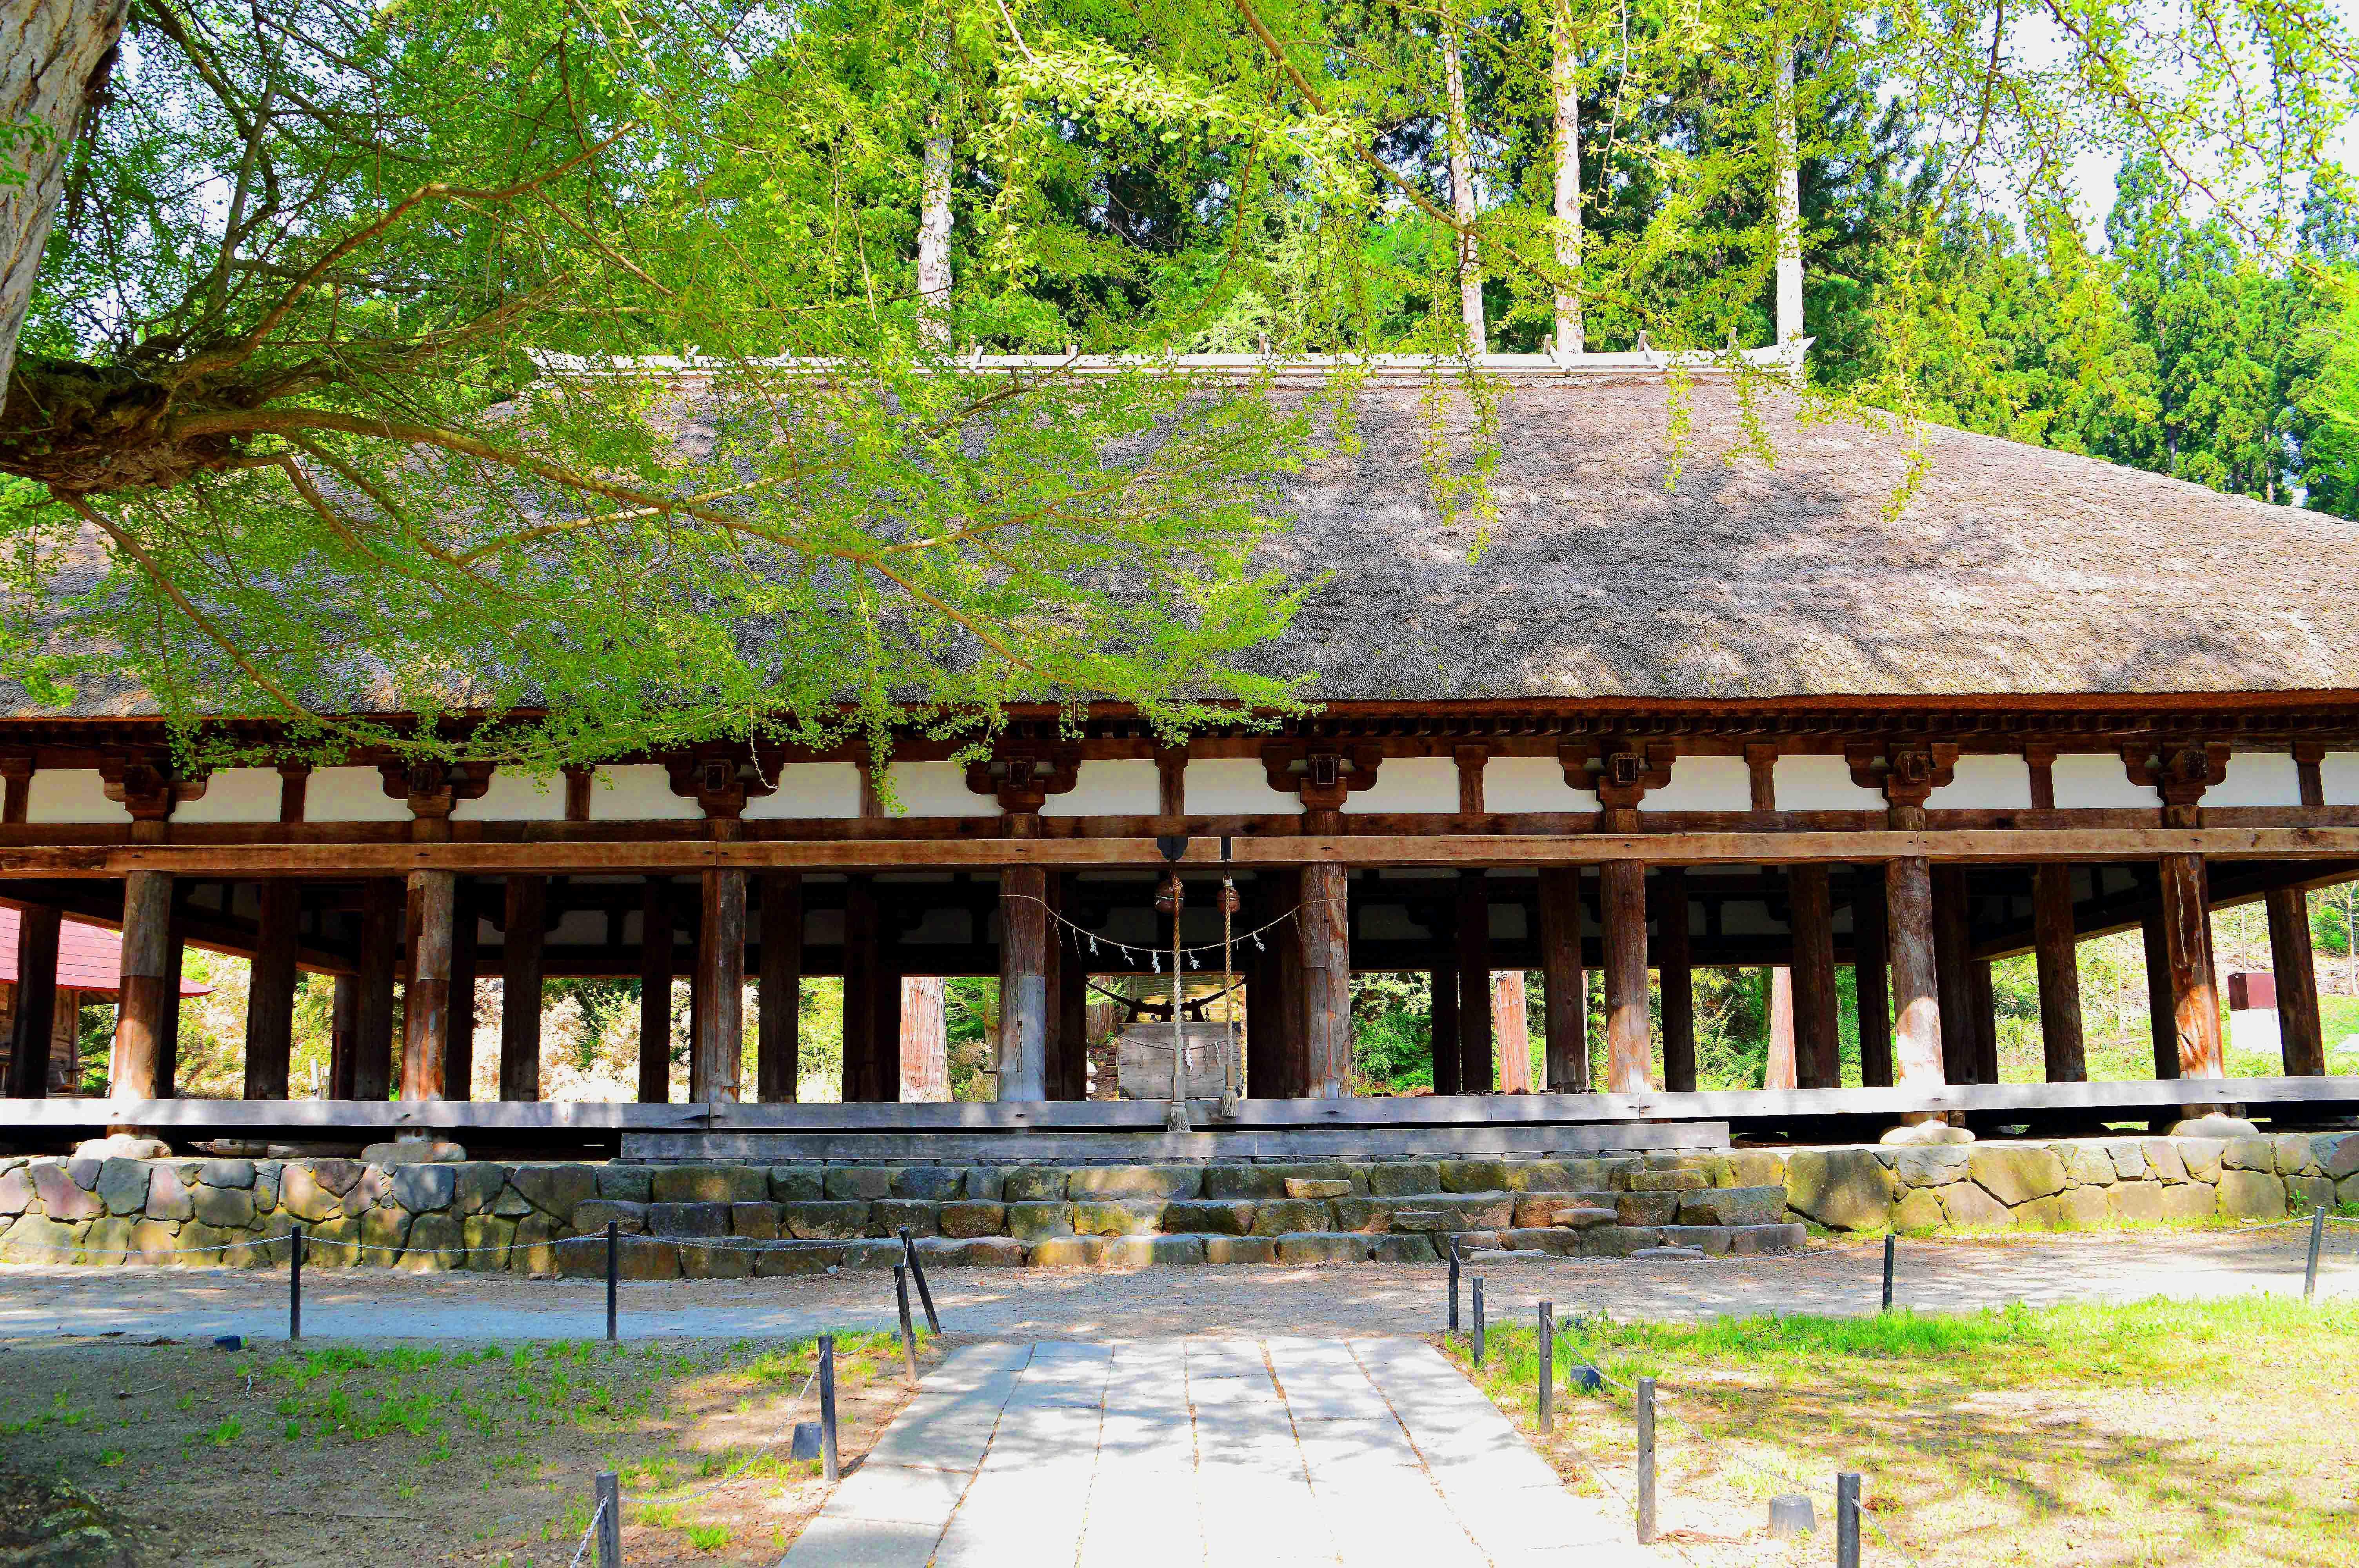 復元された長床 新宮神社 福島県喜多方市